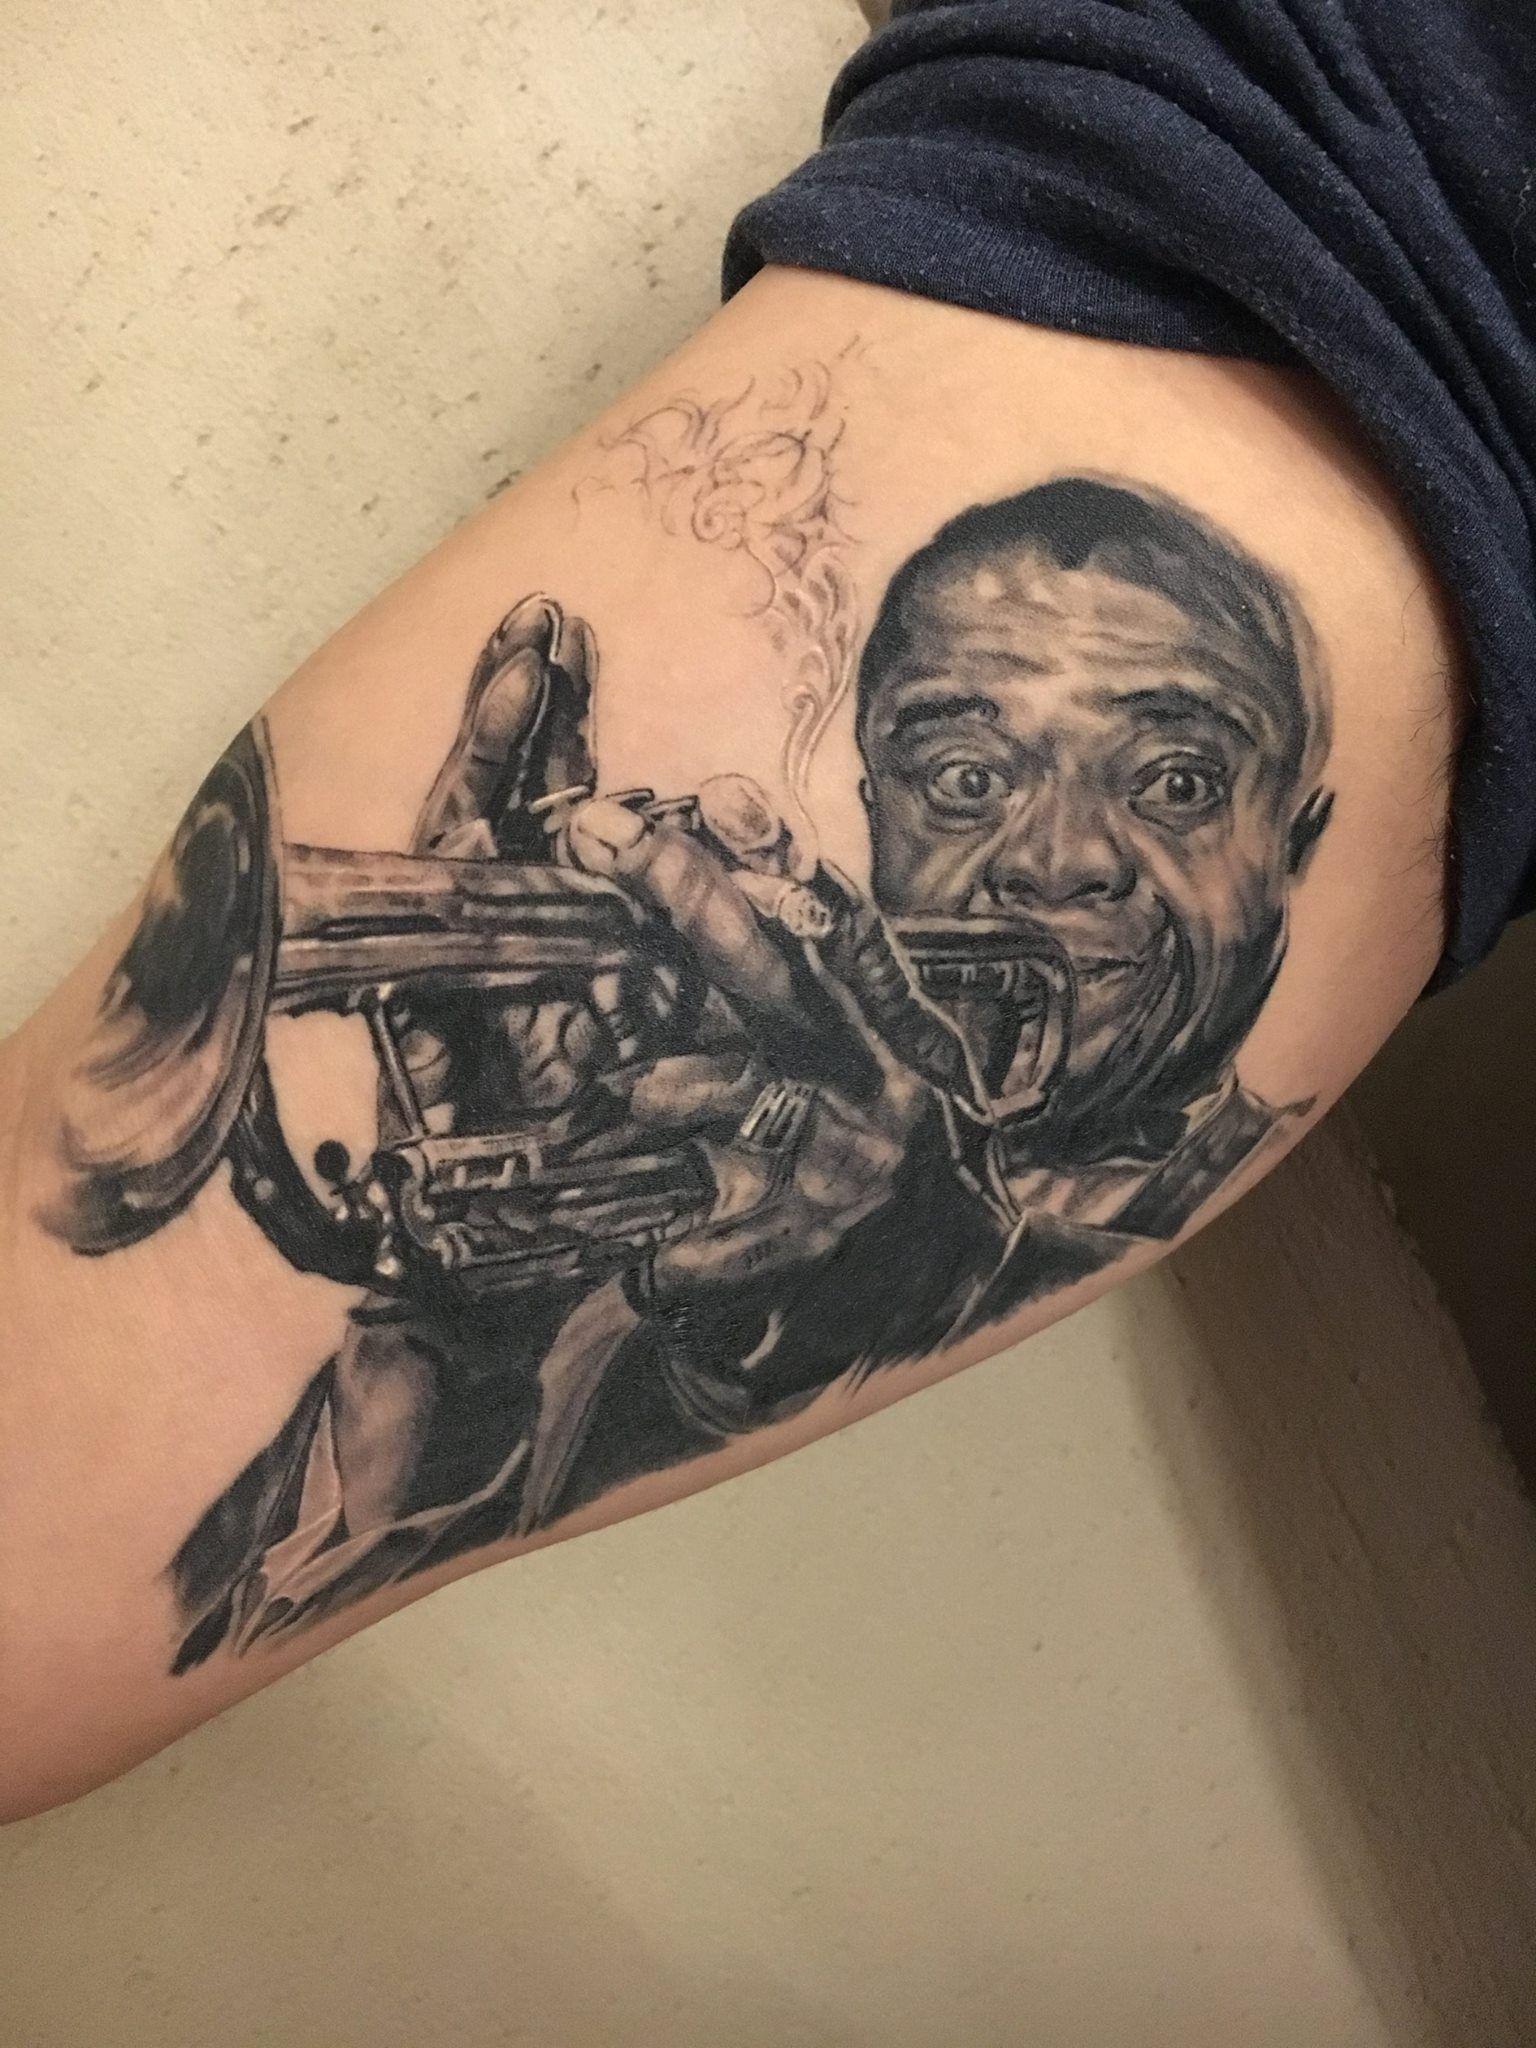 Louis Armstrong Potrait Tattoo Febianto Eskelinen La Muerte Ink regarding dimensions 1536 X 2048